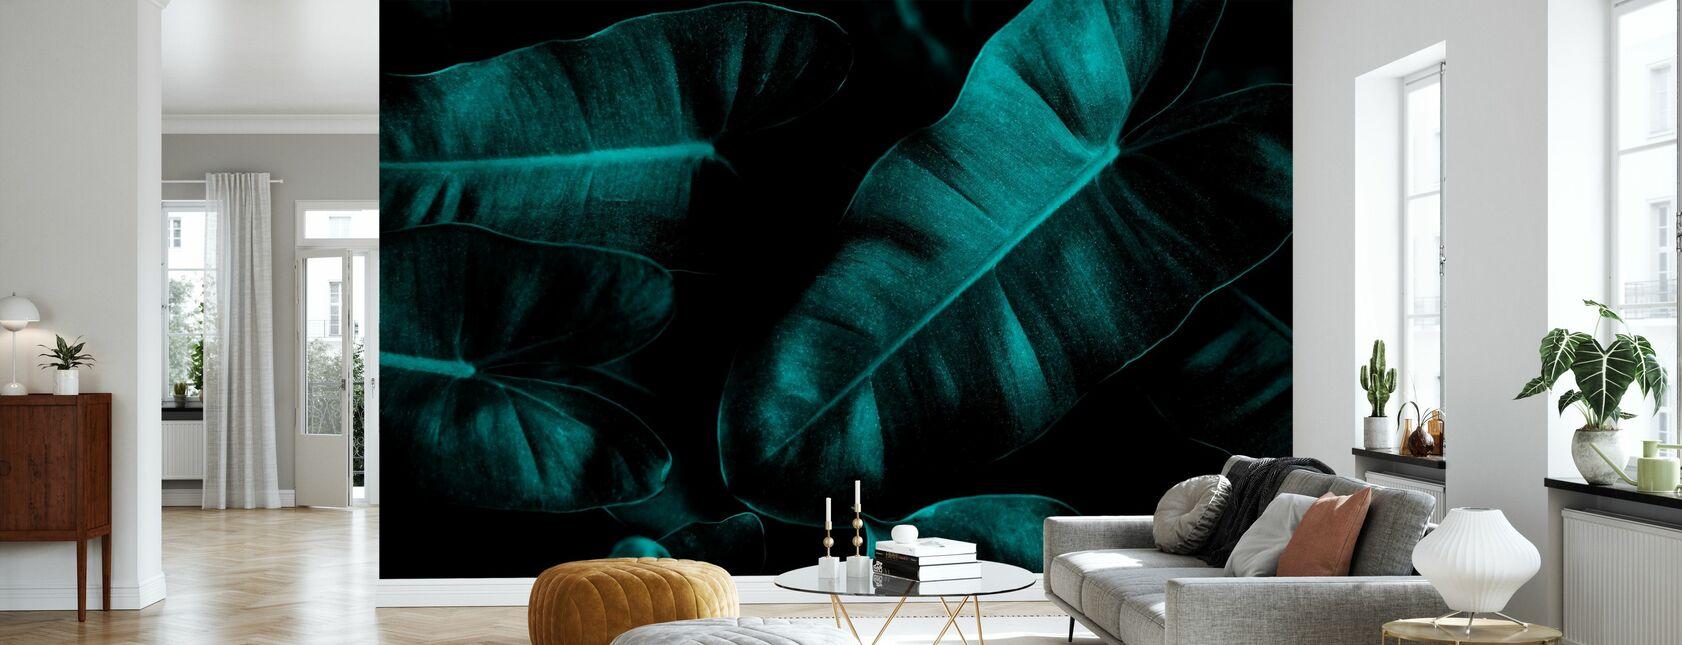 Beach - Wallpaper - Living Room